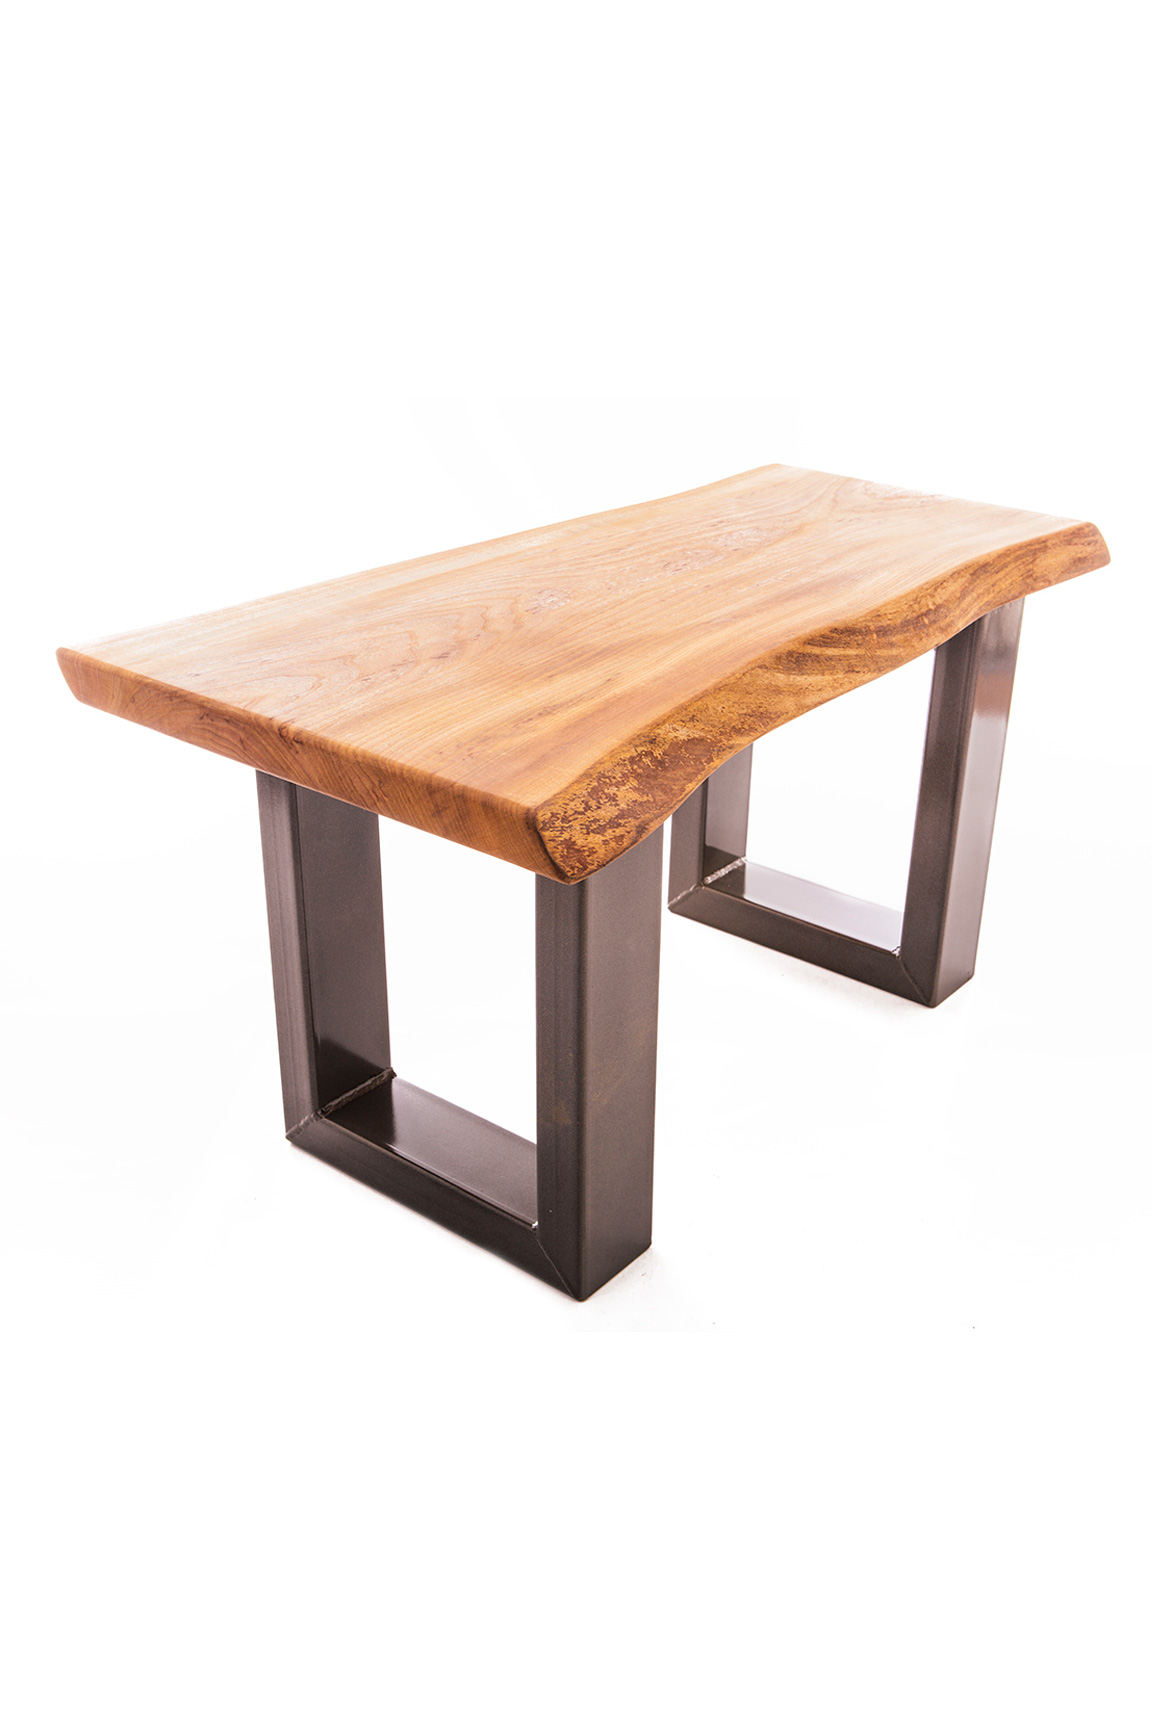 Live Edge Elm Coffee Table on Chunky Box Steel Legs — Paul Frampton